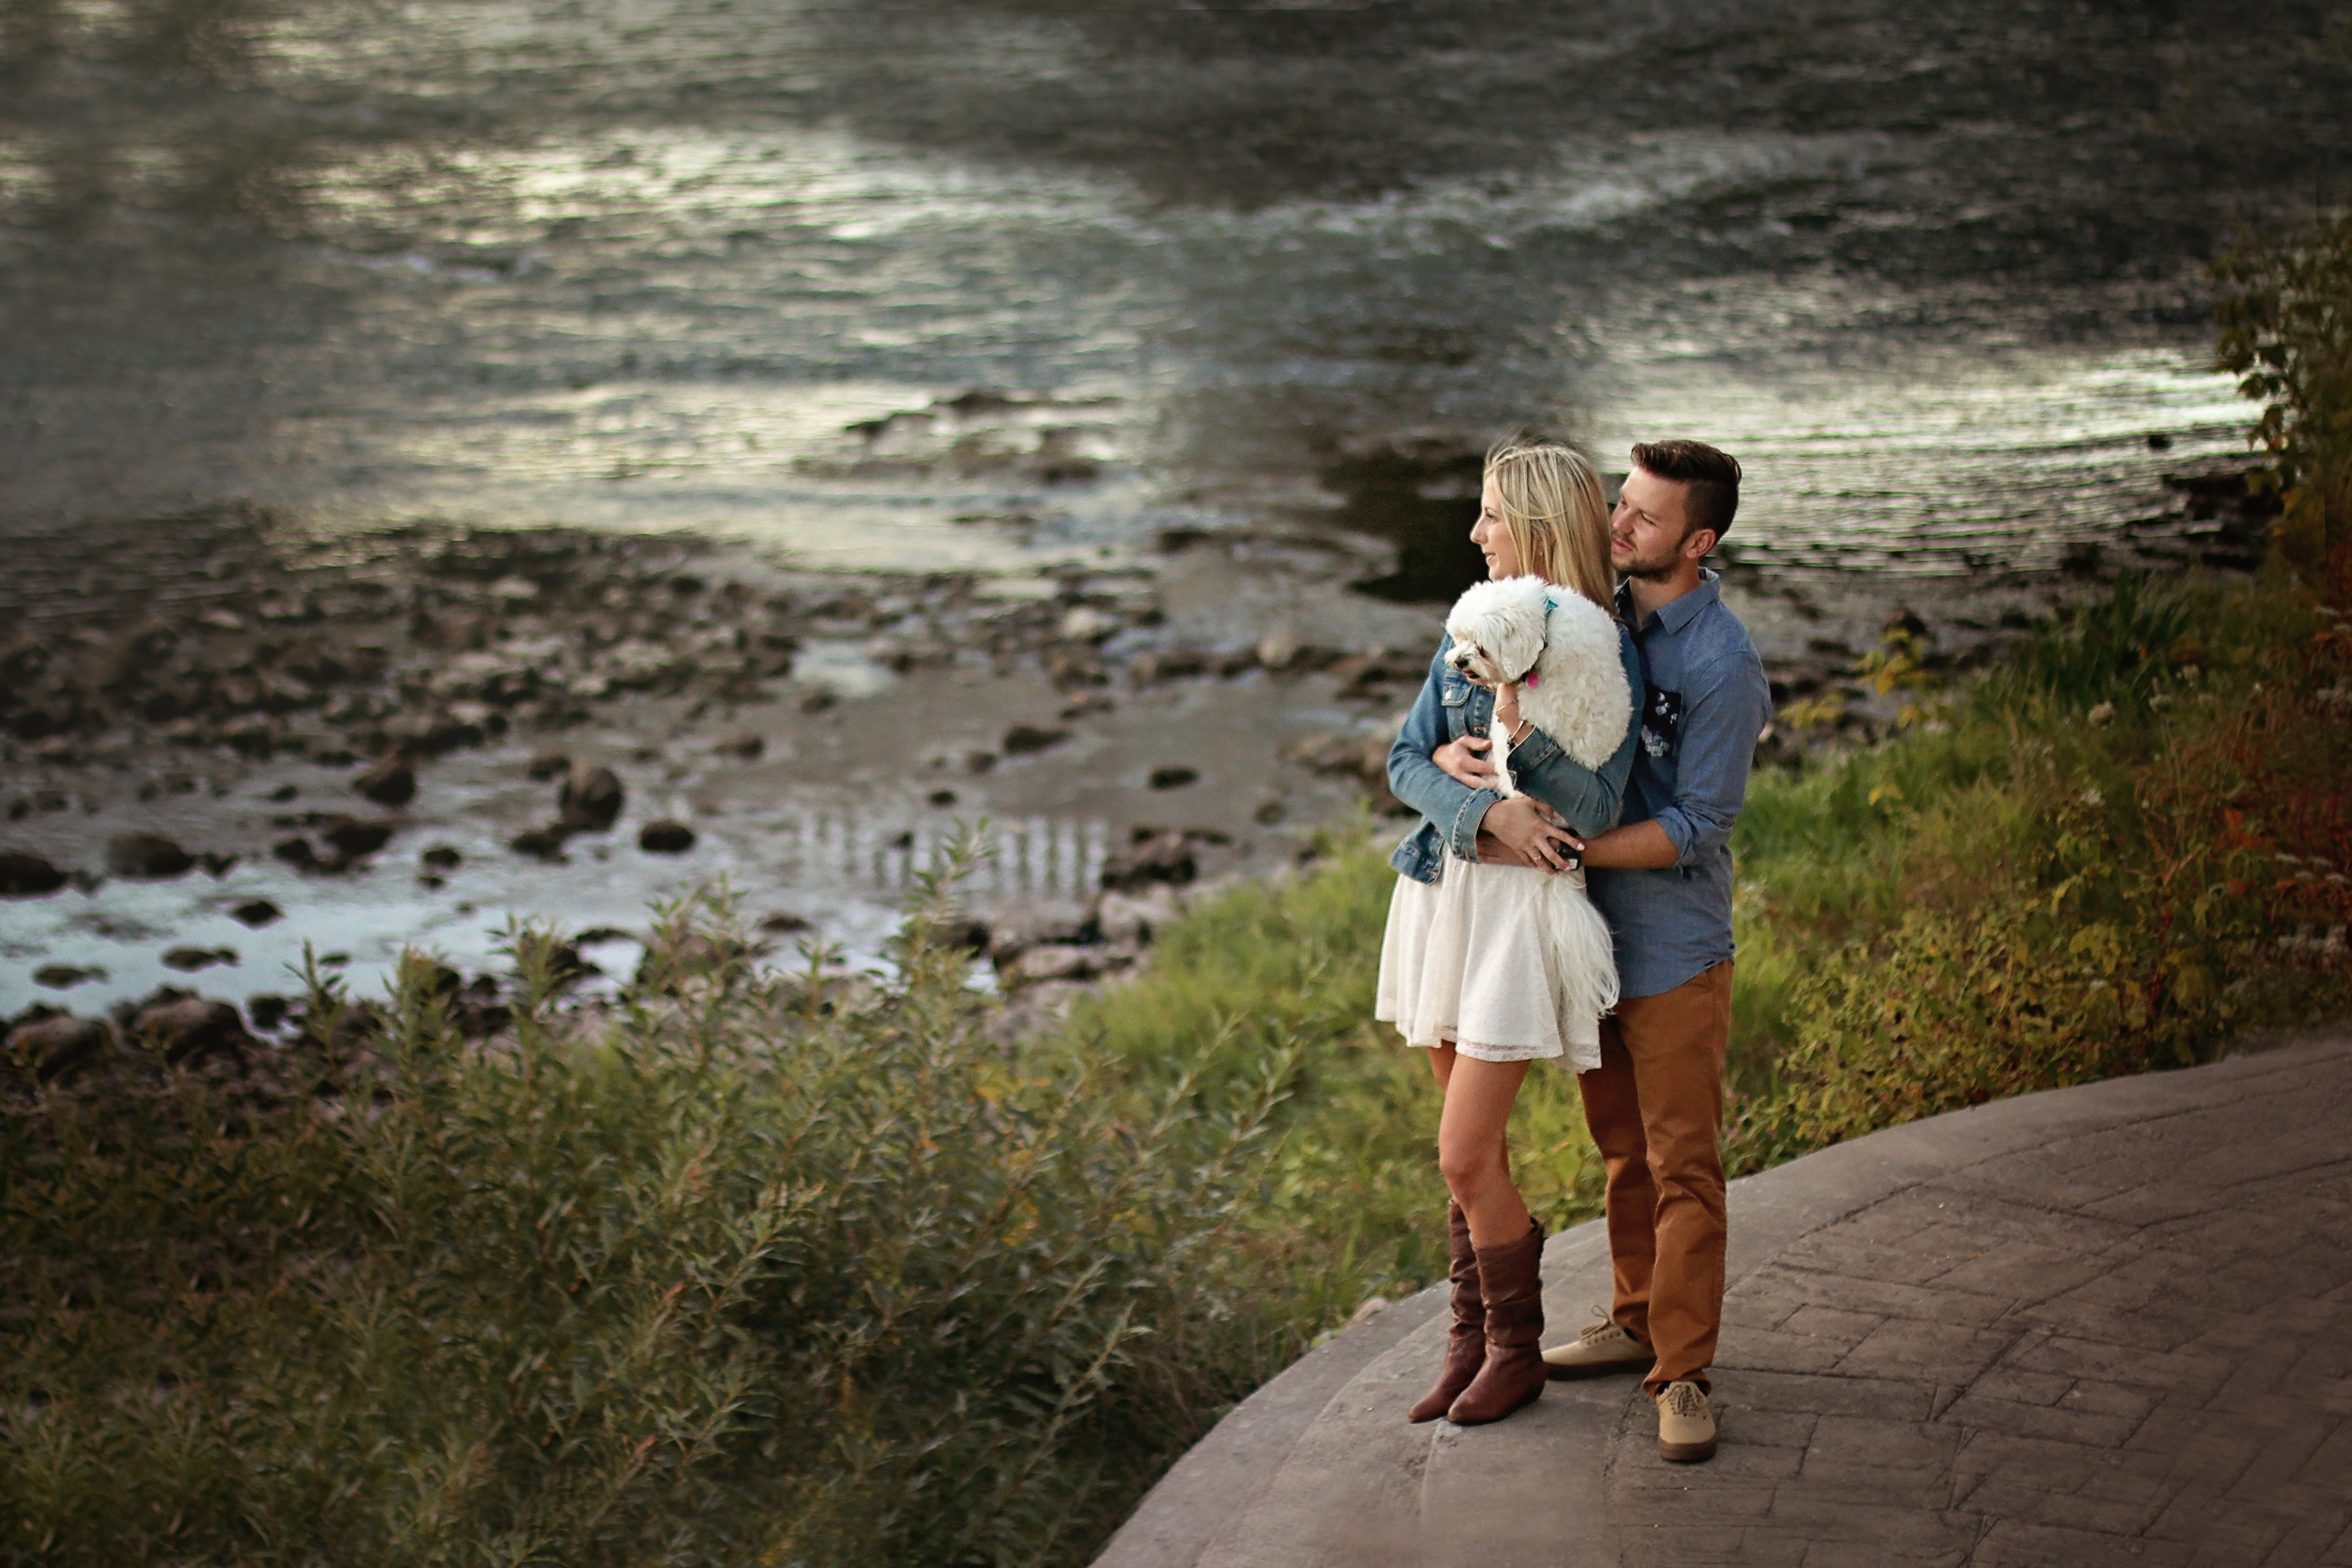 Engagement Session, Stella Ella Ola Photography, Brantford, Ontario, Canada Engagement, Couples photography,